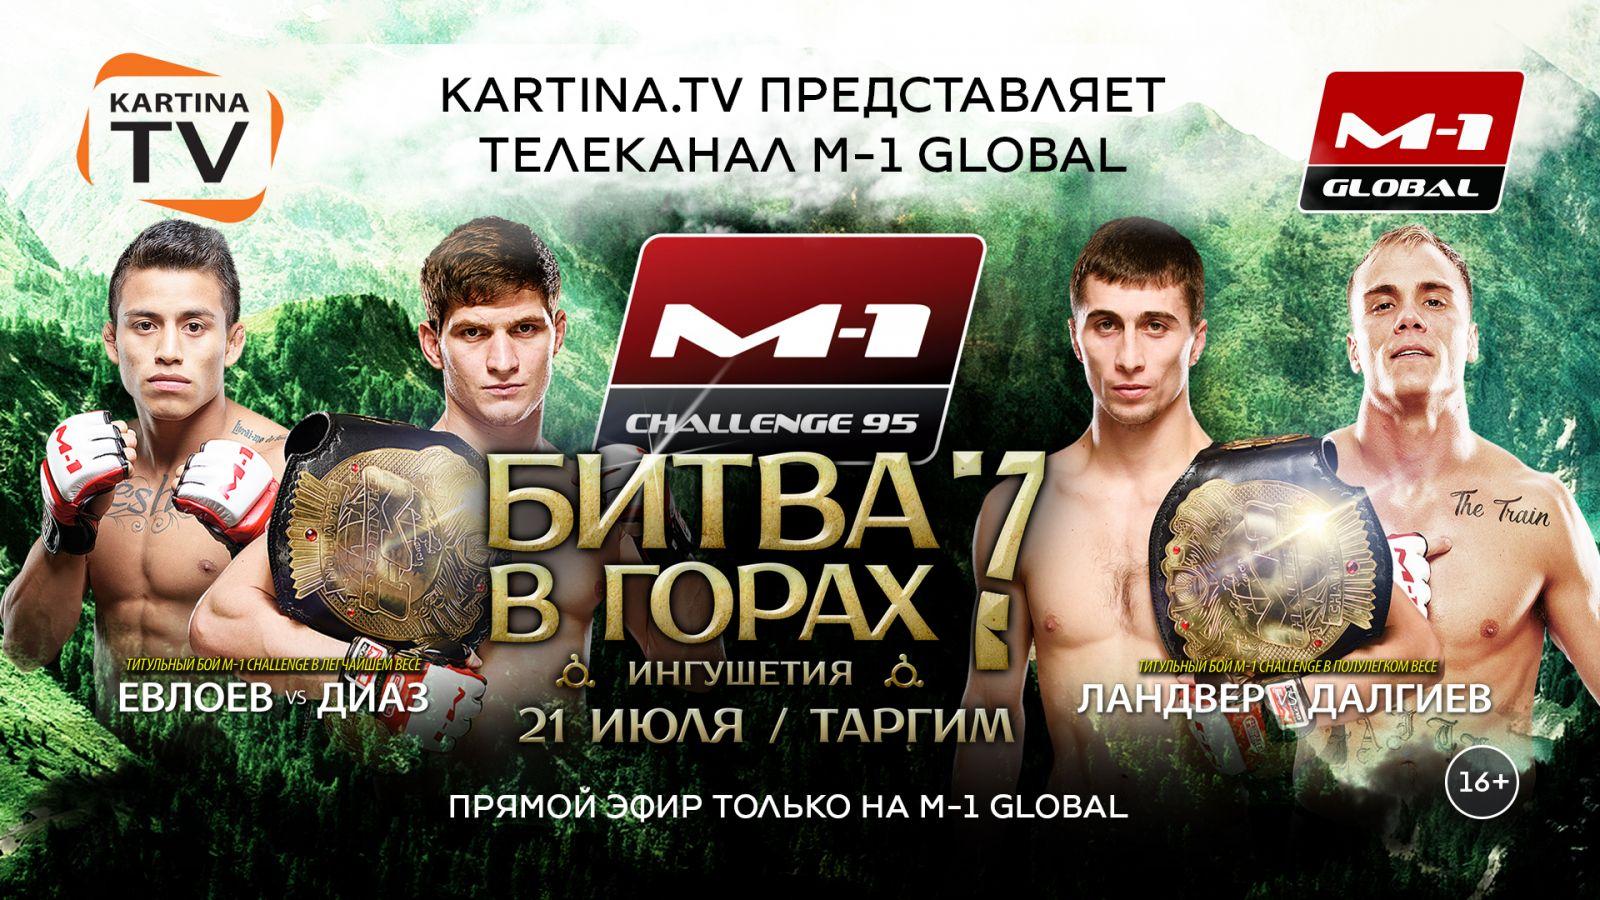 Канал М-1 Global в пакете Kartina.TV: чемпионские бои, звезды ринга, новости спорта